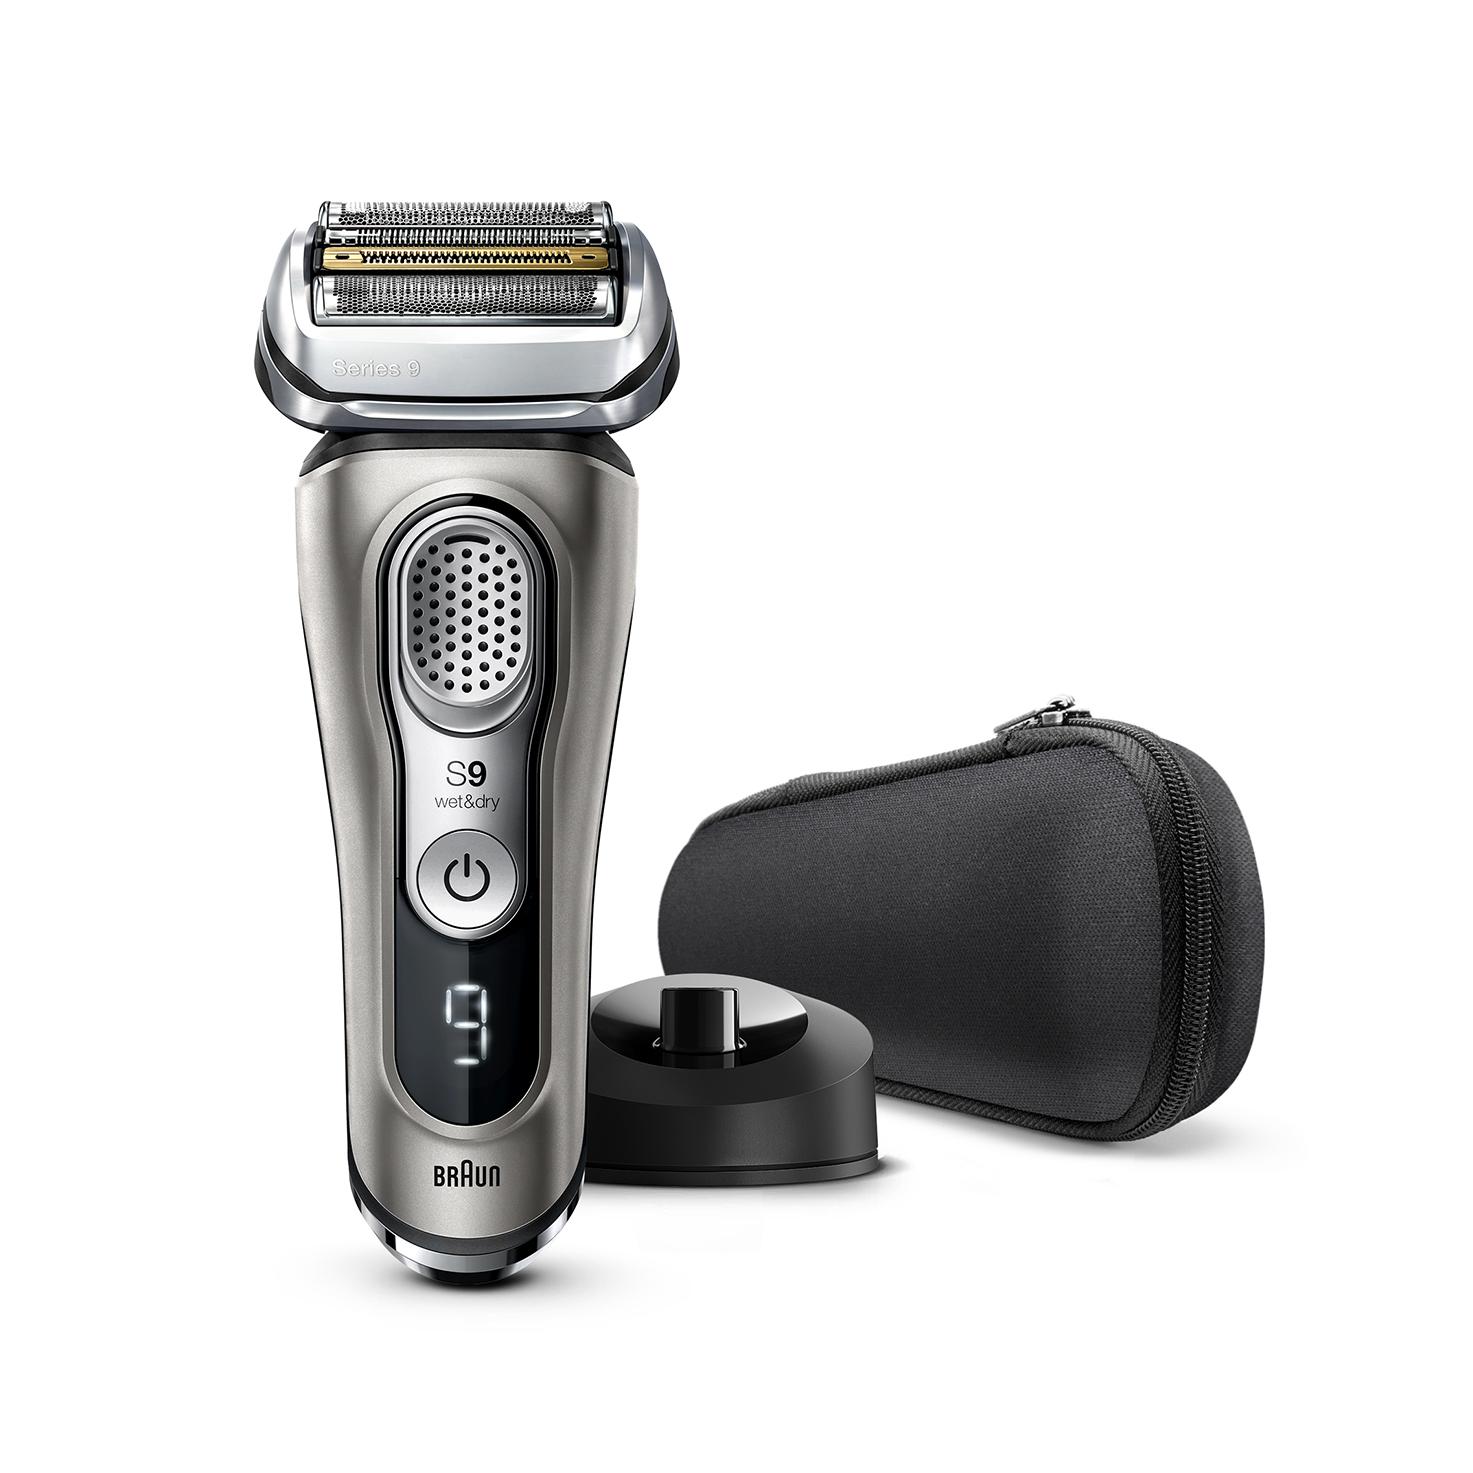 Braun - Series 9 9345s Wet & Dry Shaver